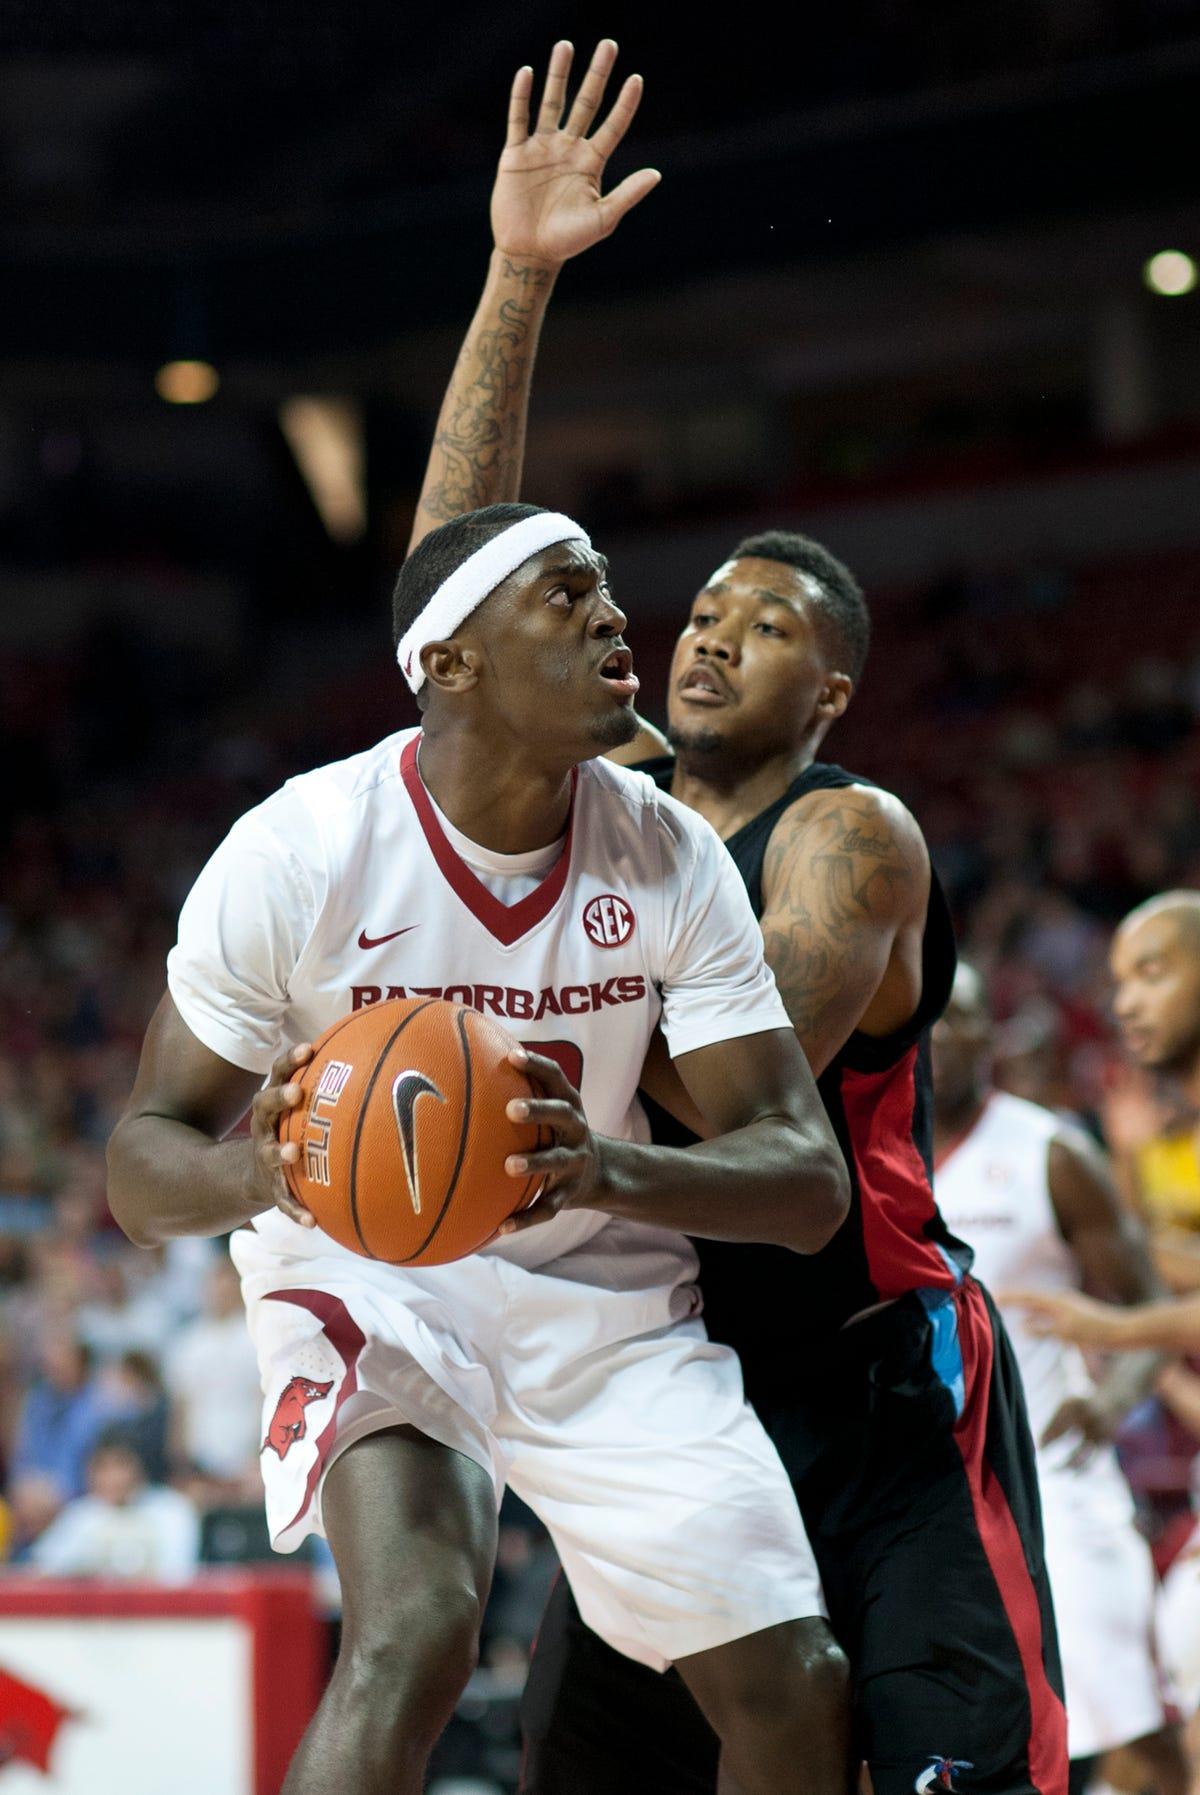 Arkansas' fortunes a key cog for SEC basketball hopes